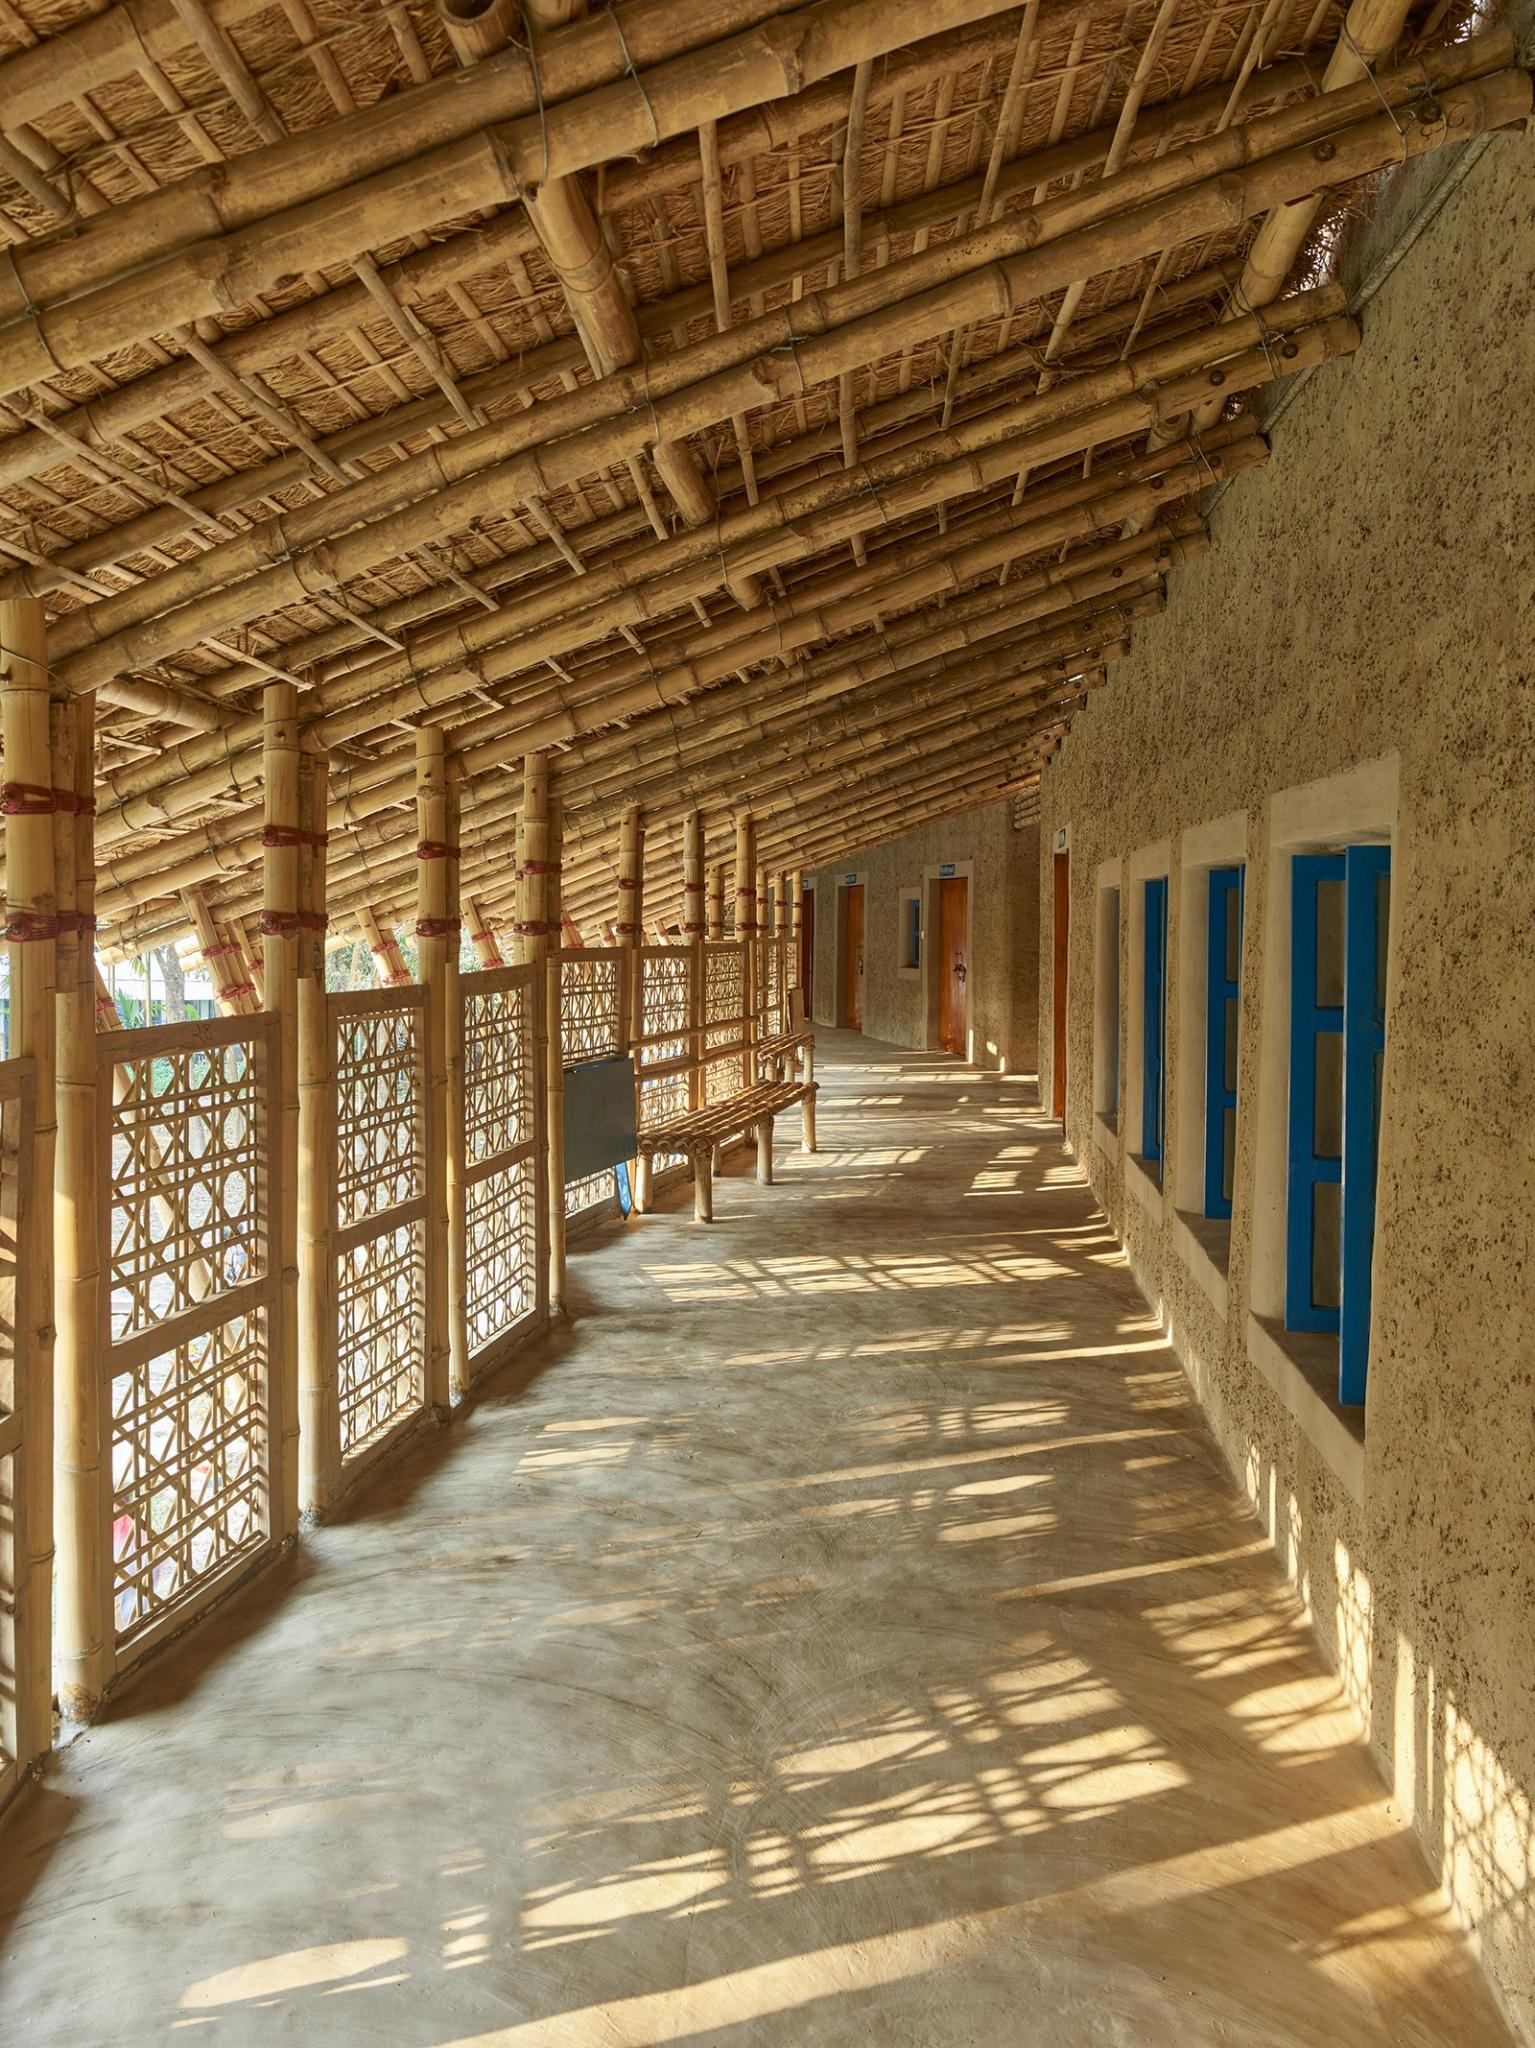 024_anandaloy_rudrapur-bangladesh-2020_studio-anna-heringer_by_kurt-hoerbst_115054_1600